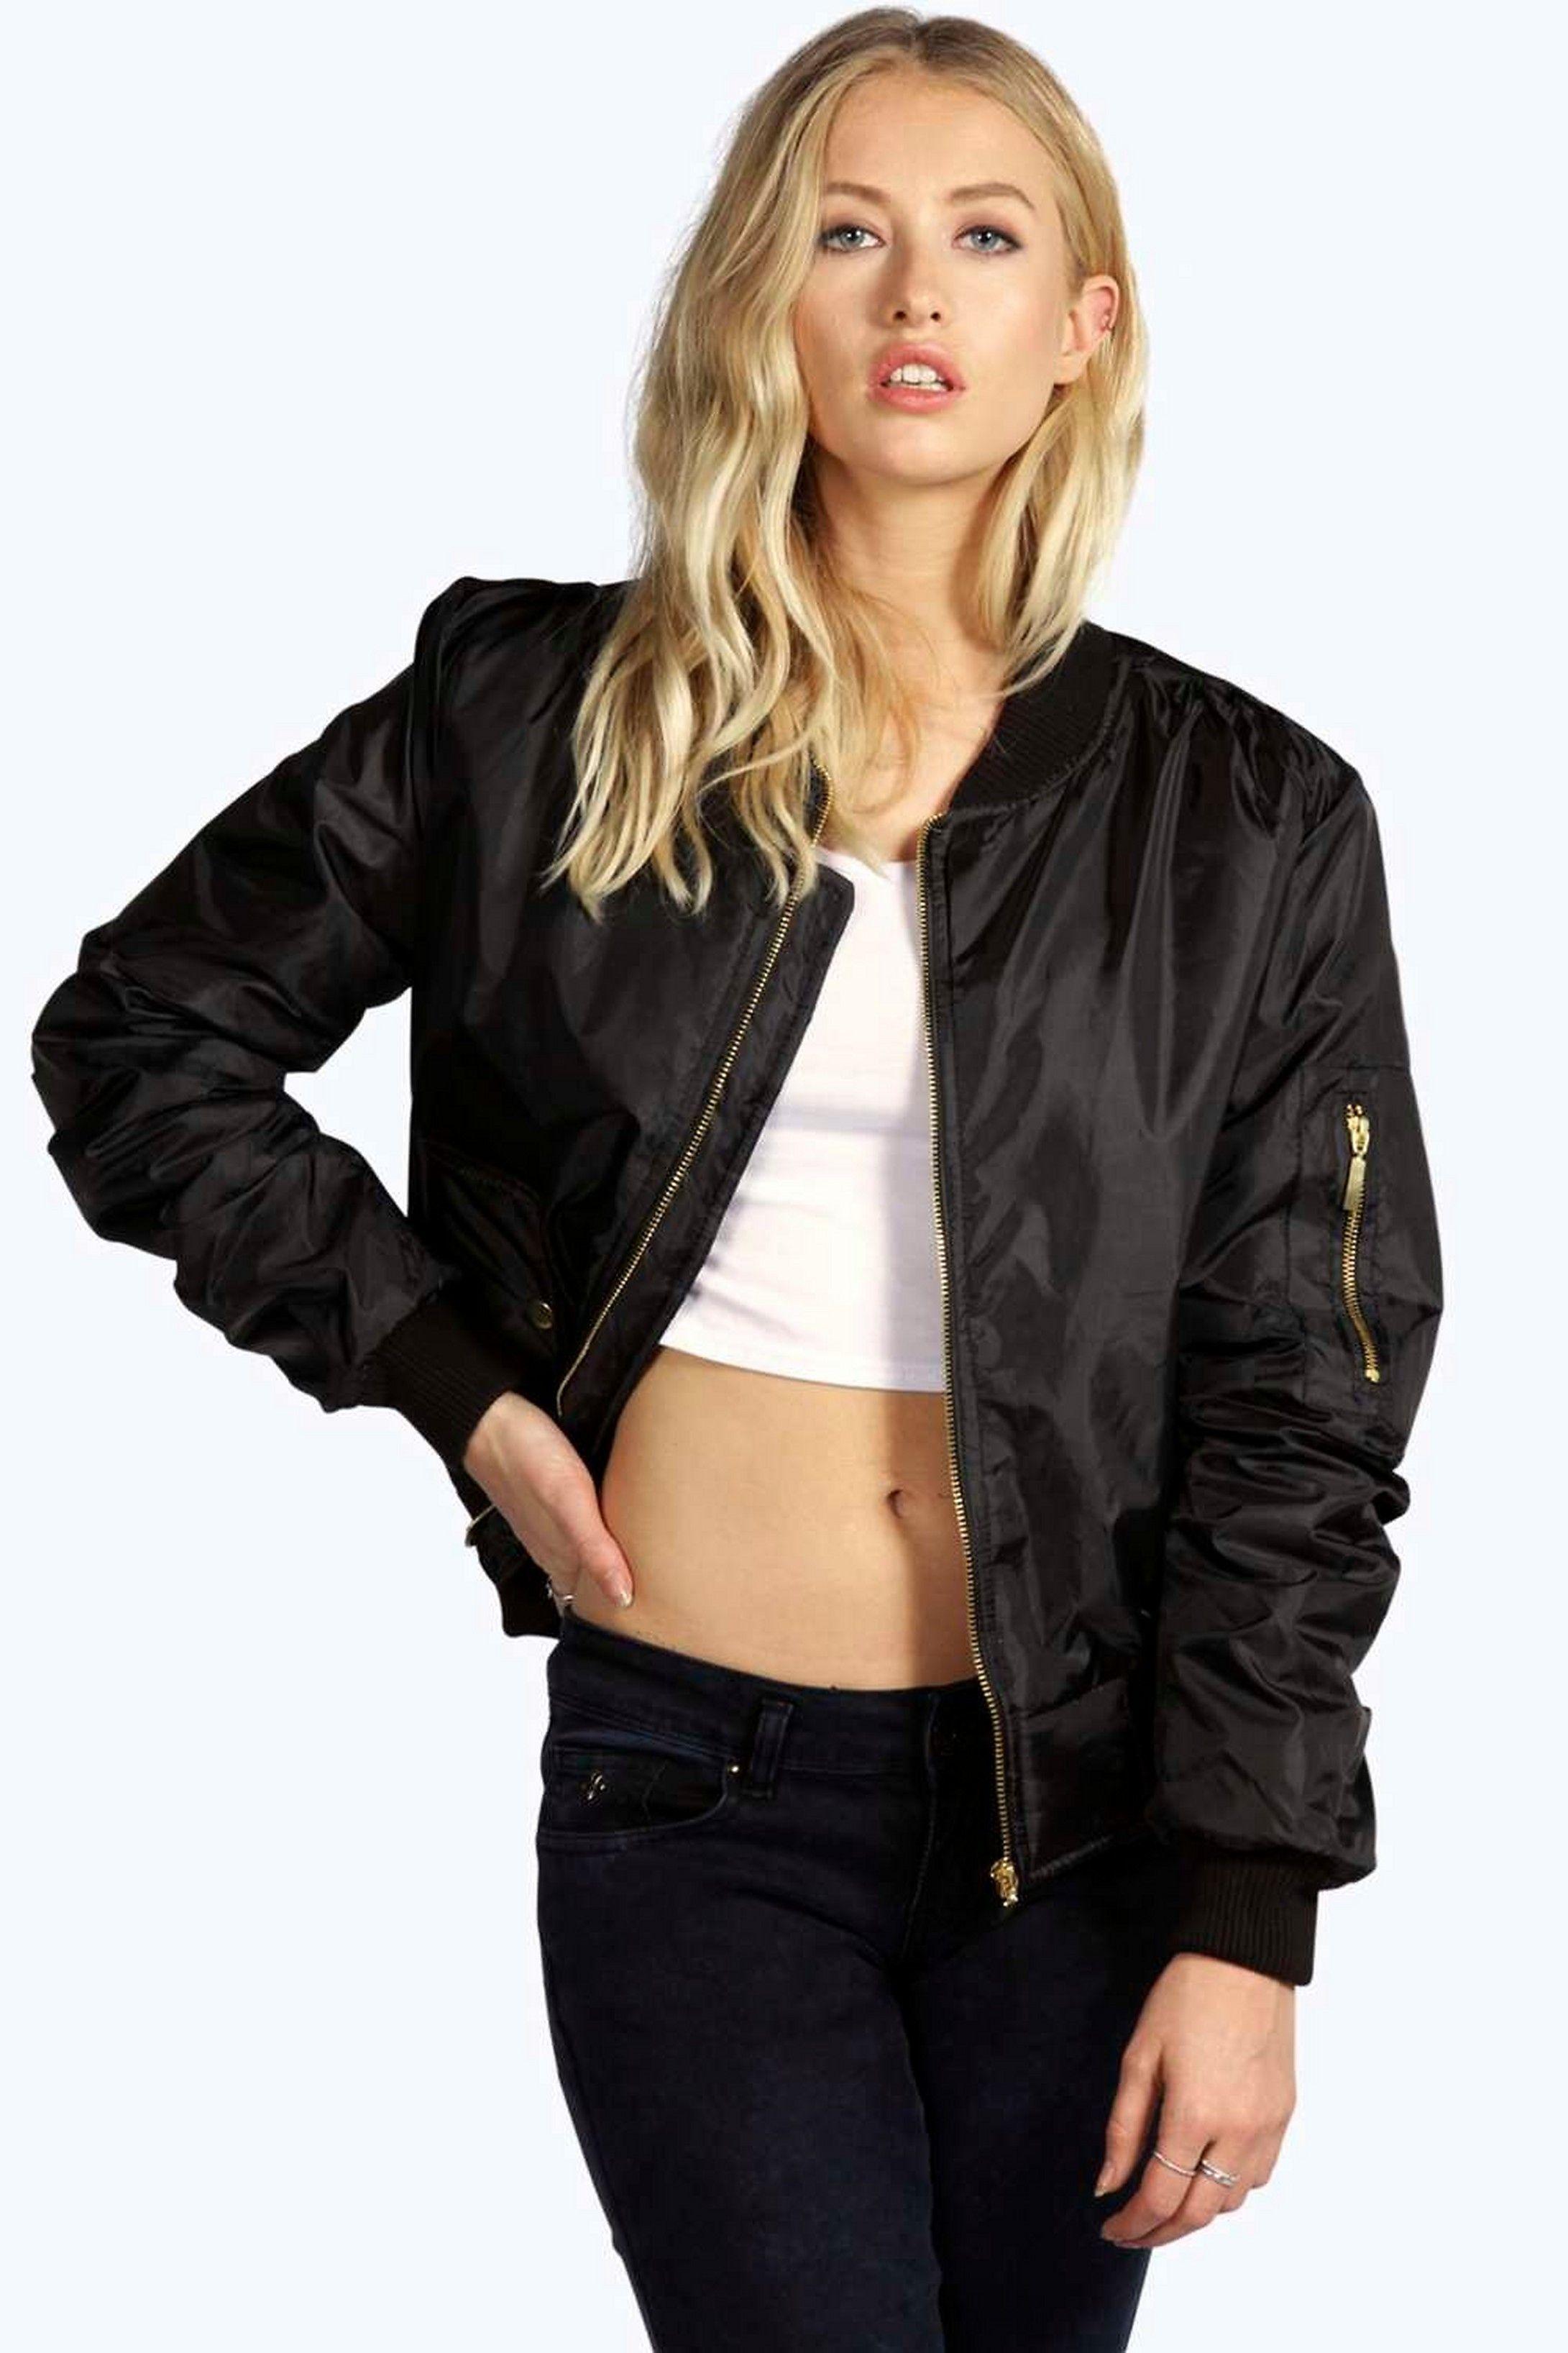 Women Jacket Vintage Zip Biker Short Padded Baseball Winter Bomber Outwear Coat